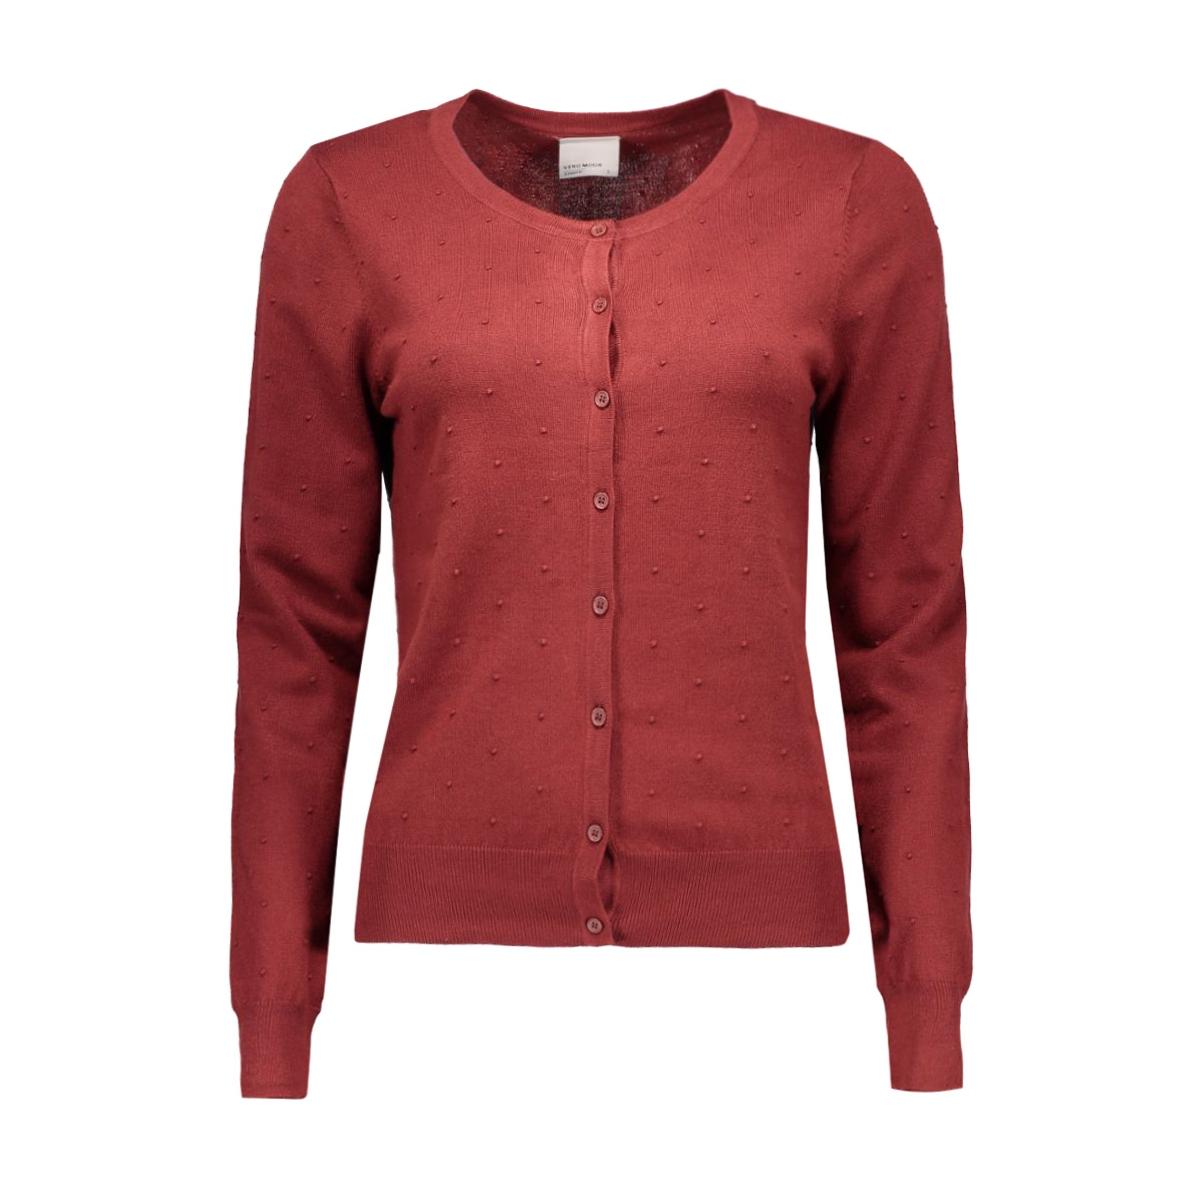 vmglory misa ls cardigan rep 10165144 vero moda vest fired brick